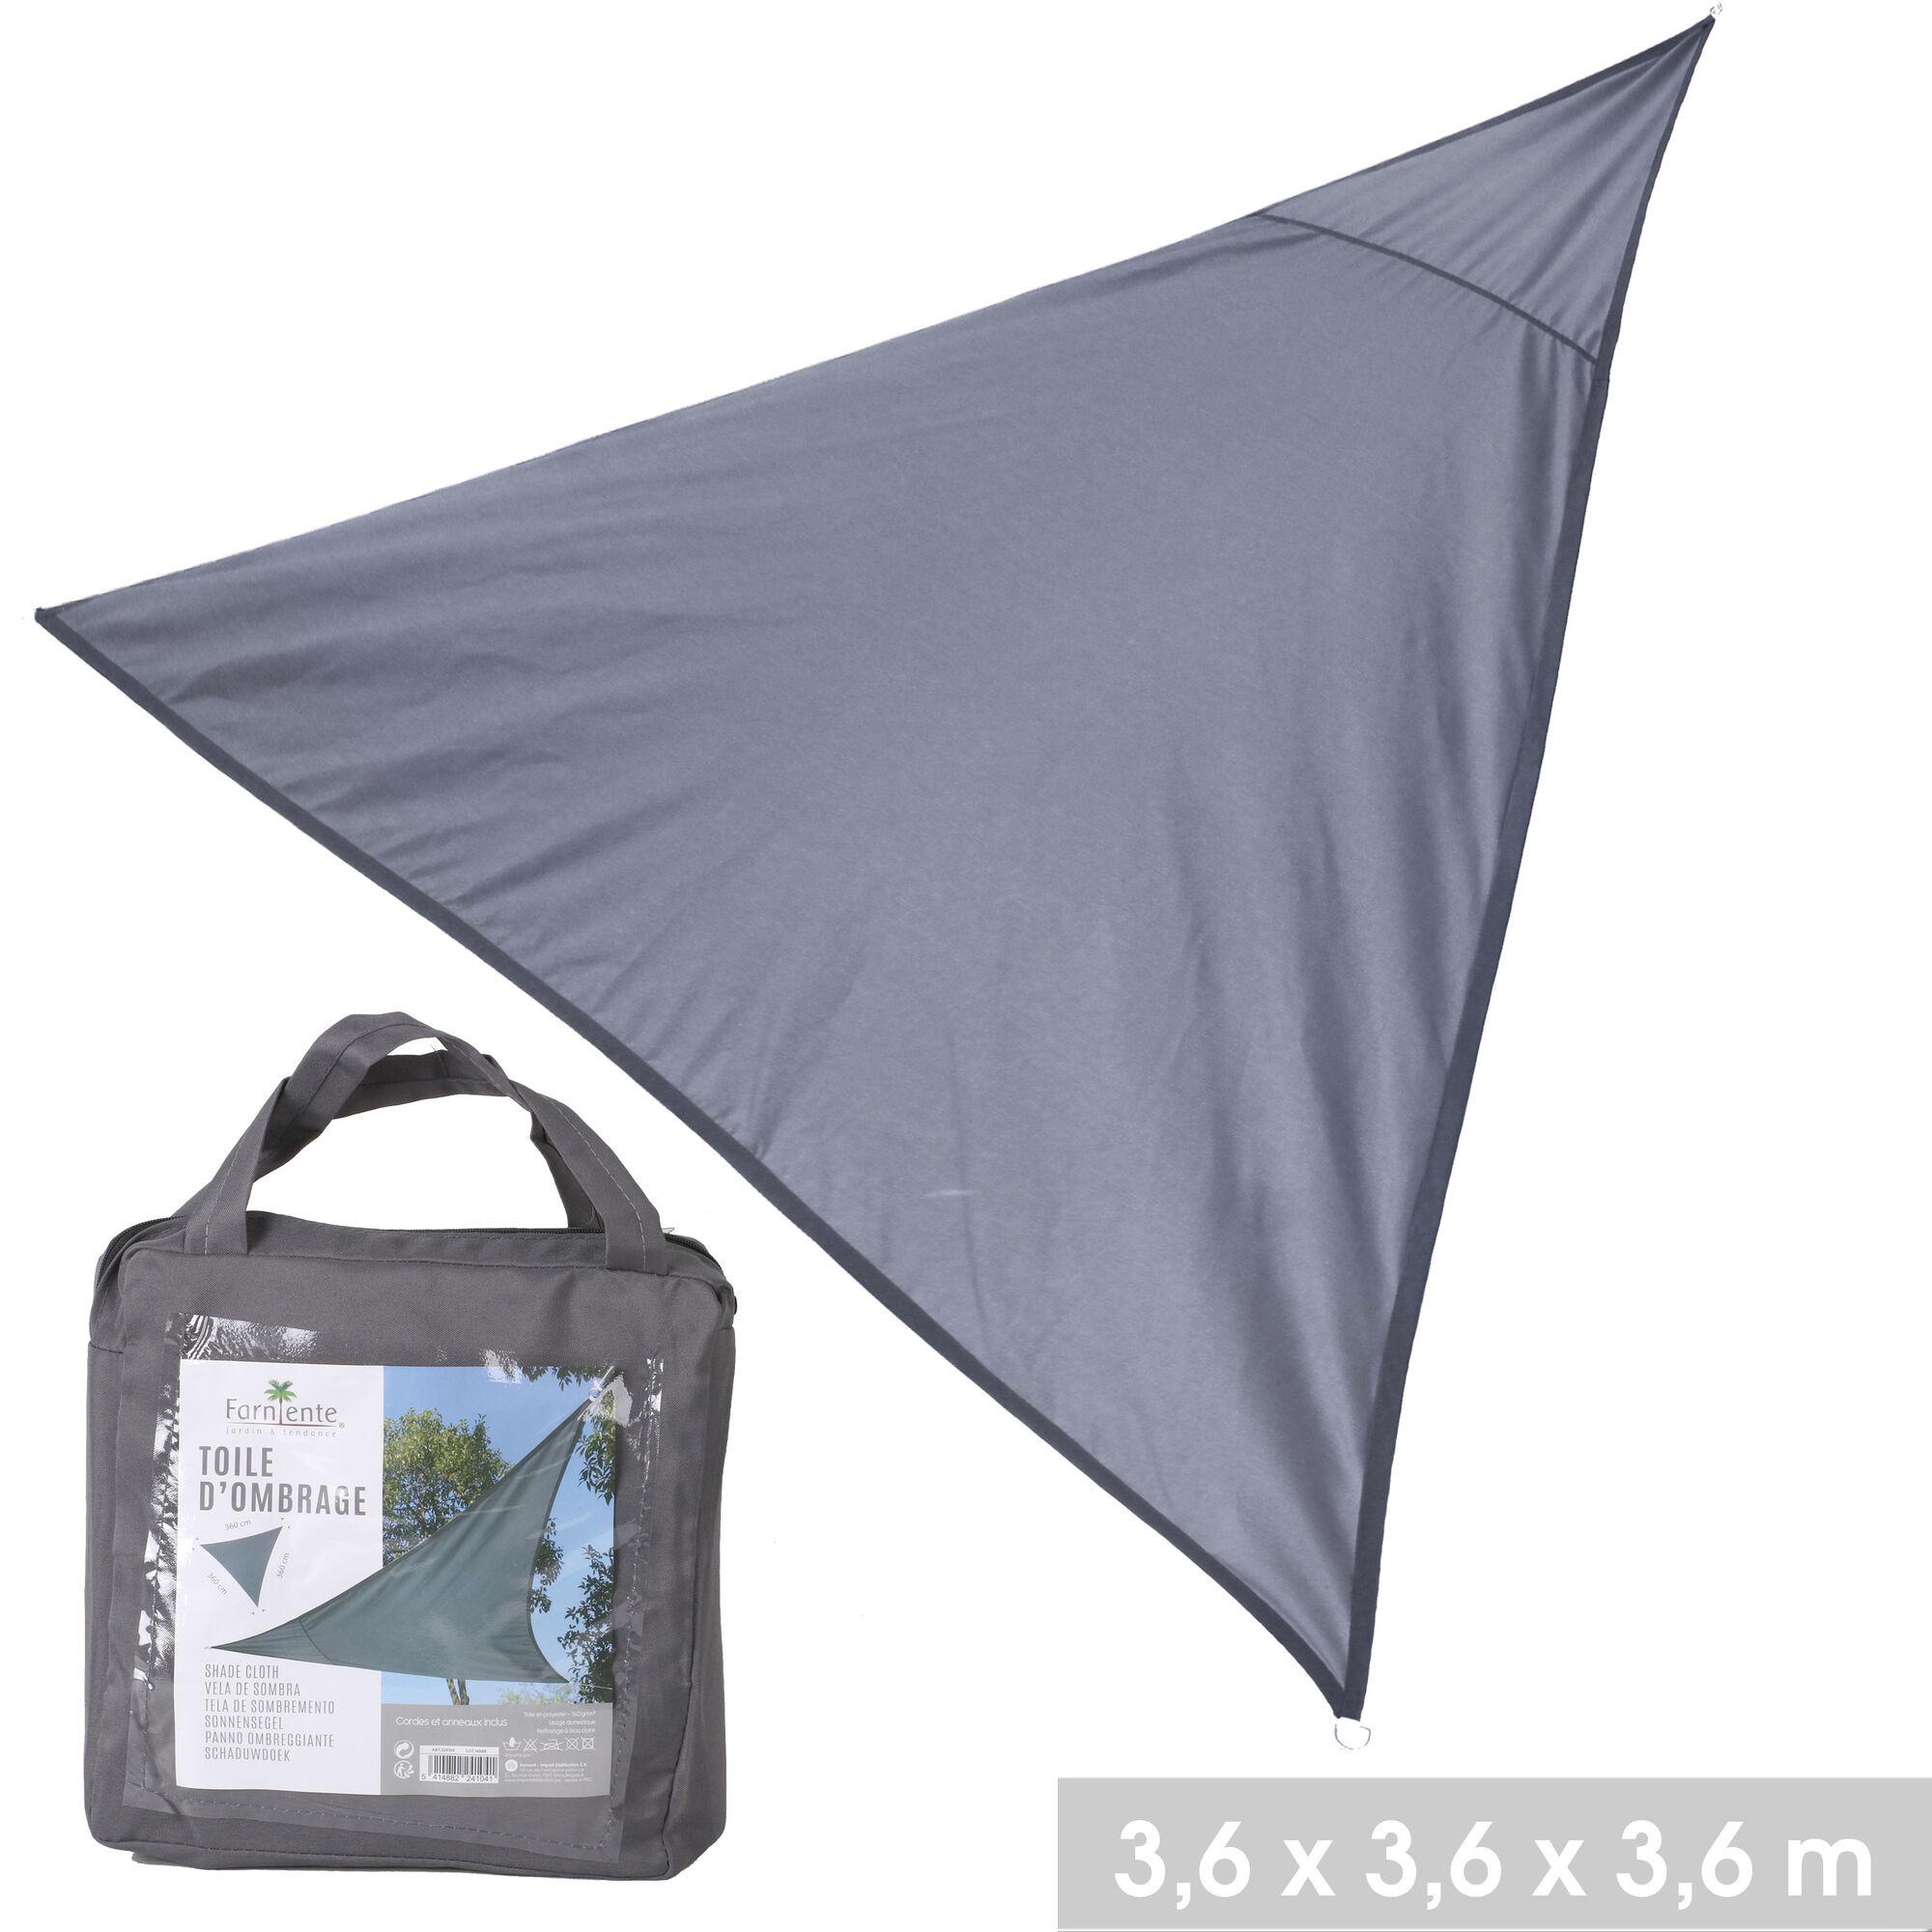 NOTRE SÉLECTION Toile d'ombrage triangle en polyester 3,6 x 3,6 x 3,6 m gris anthracite